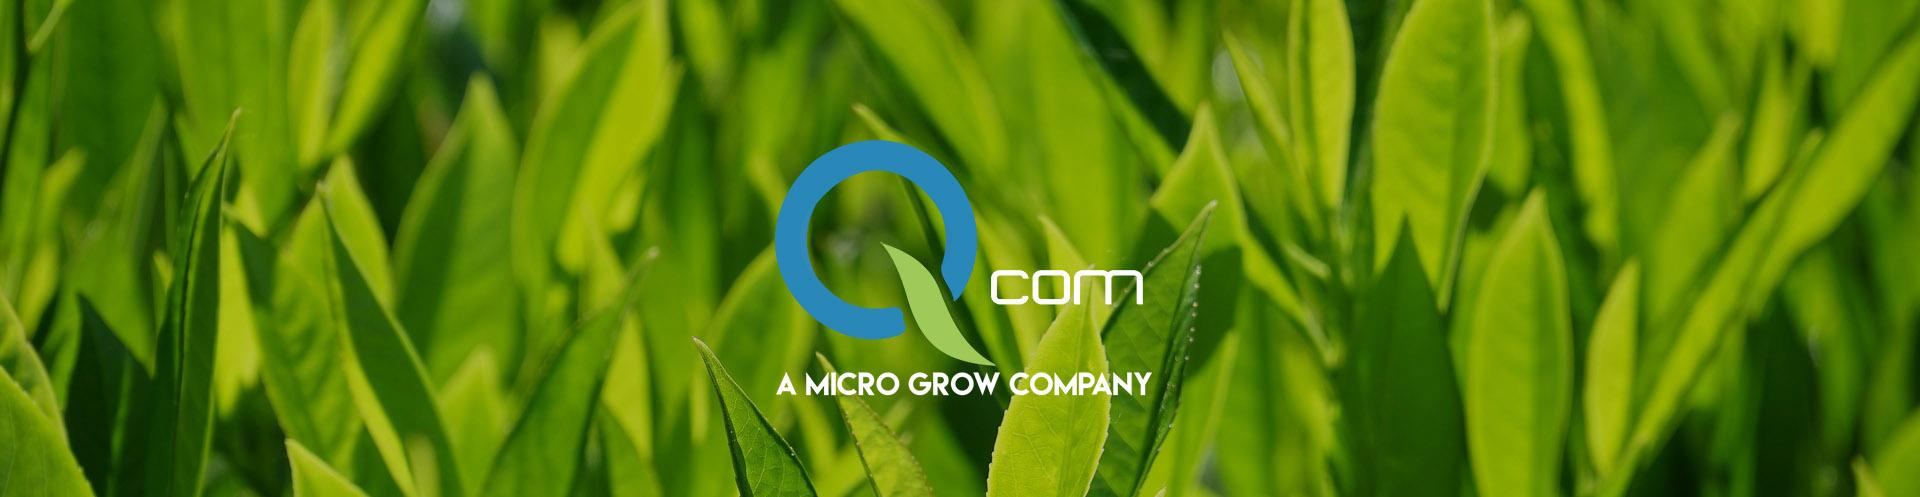 QCom Banner Slim w logo MGco